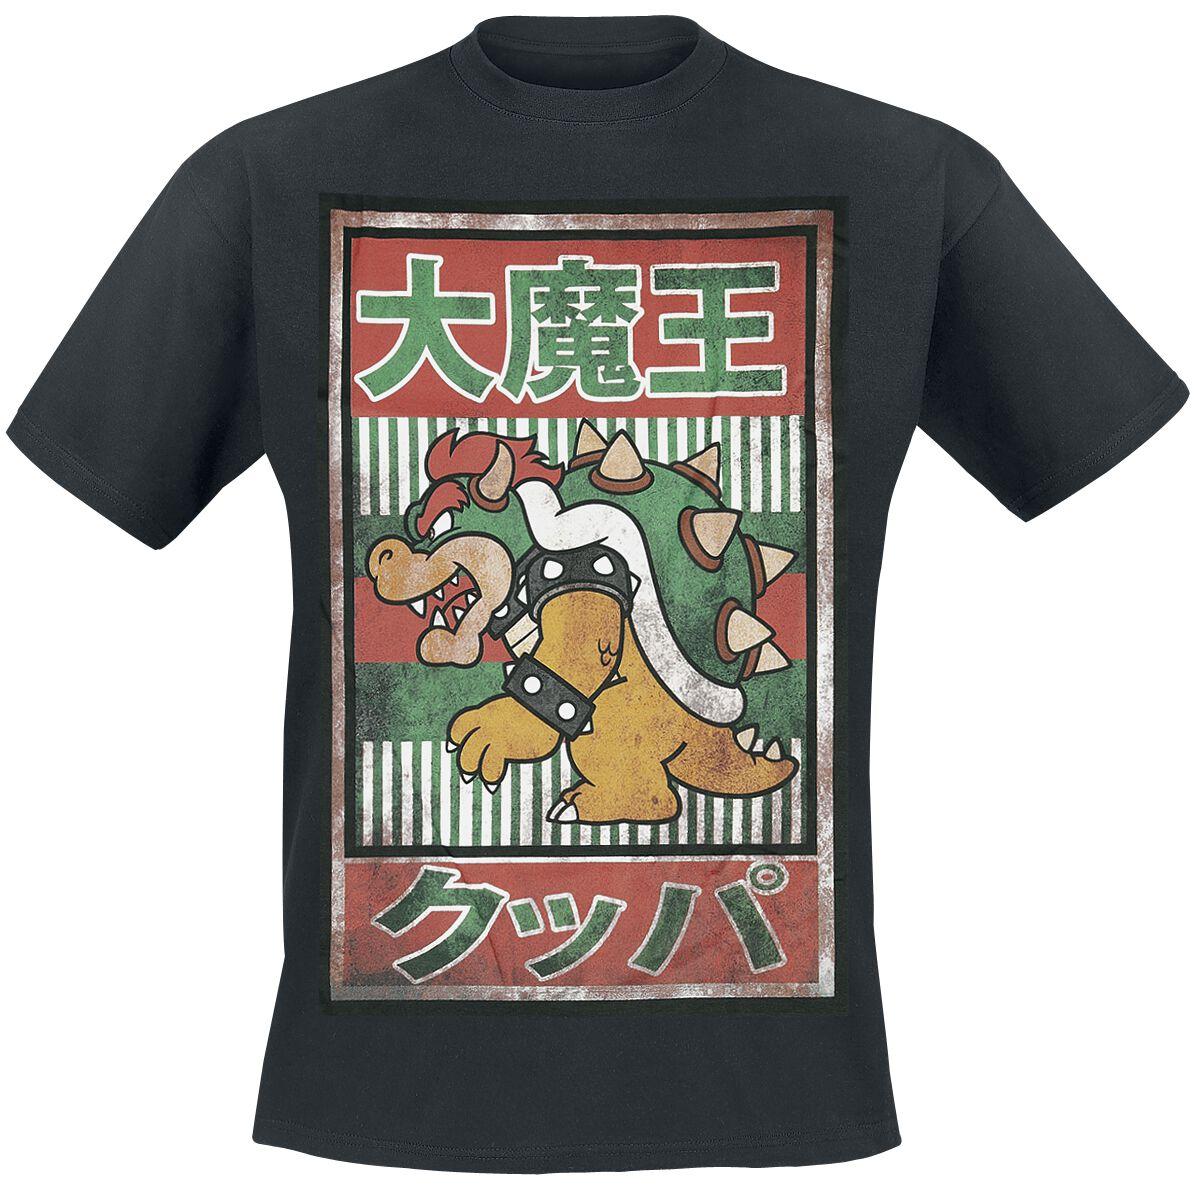 Vintage bowser super mario t shirt for Vintage t shirt company